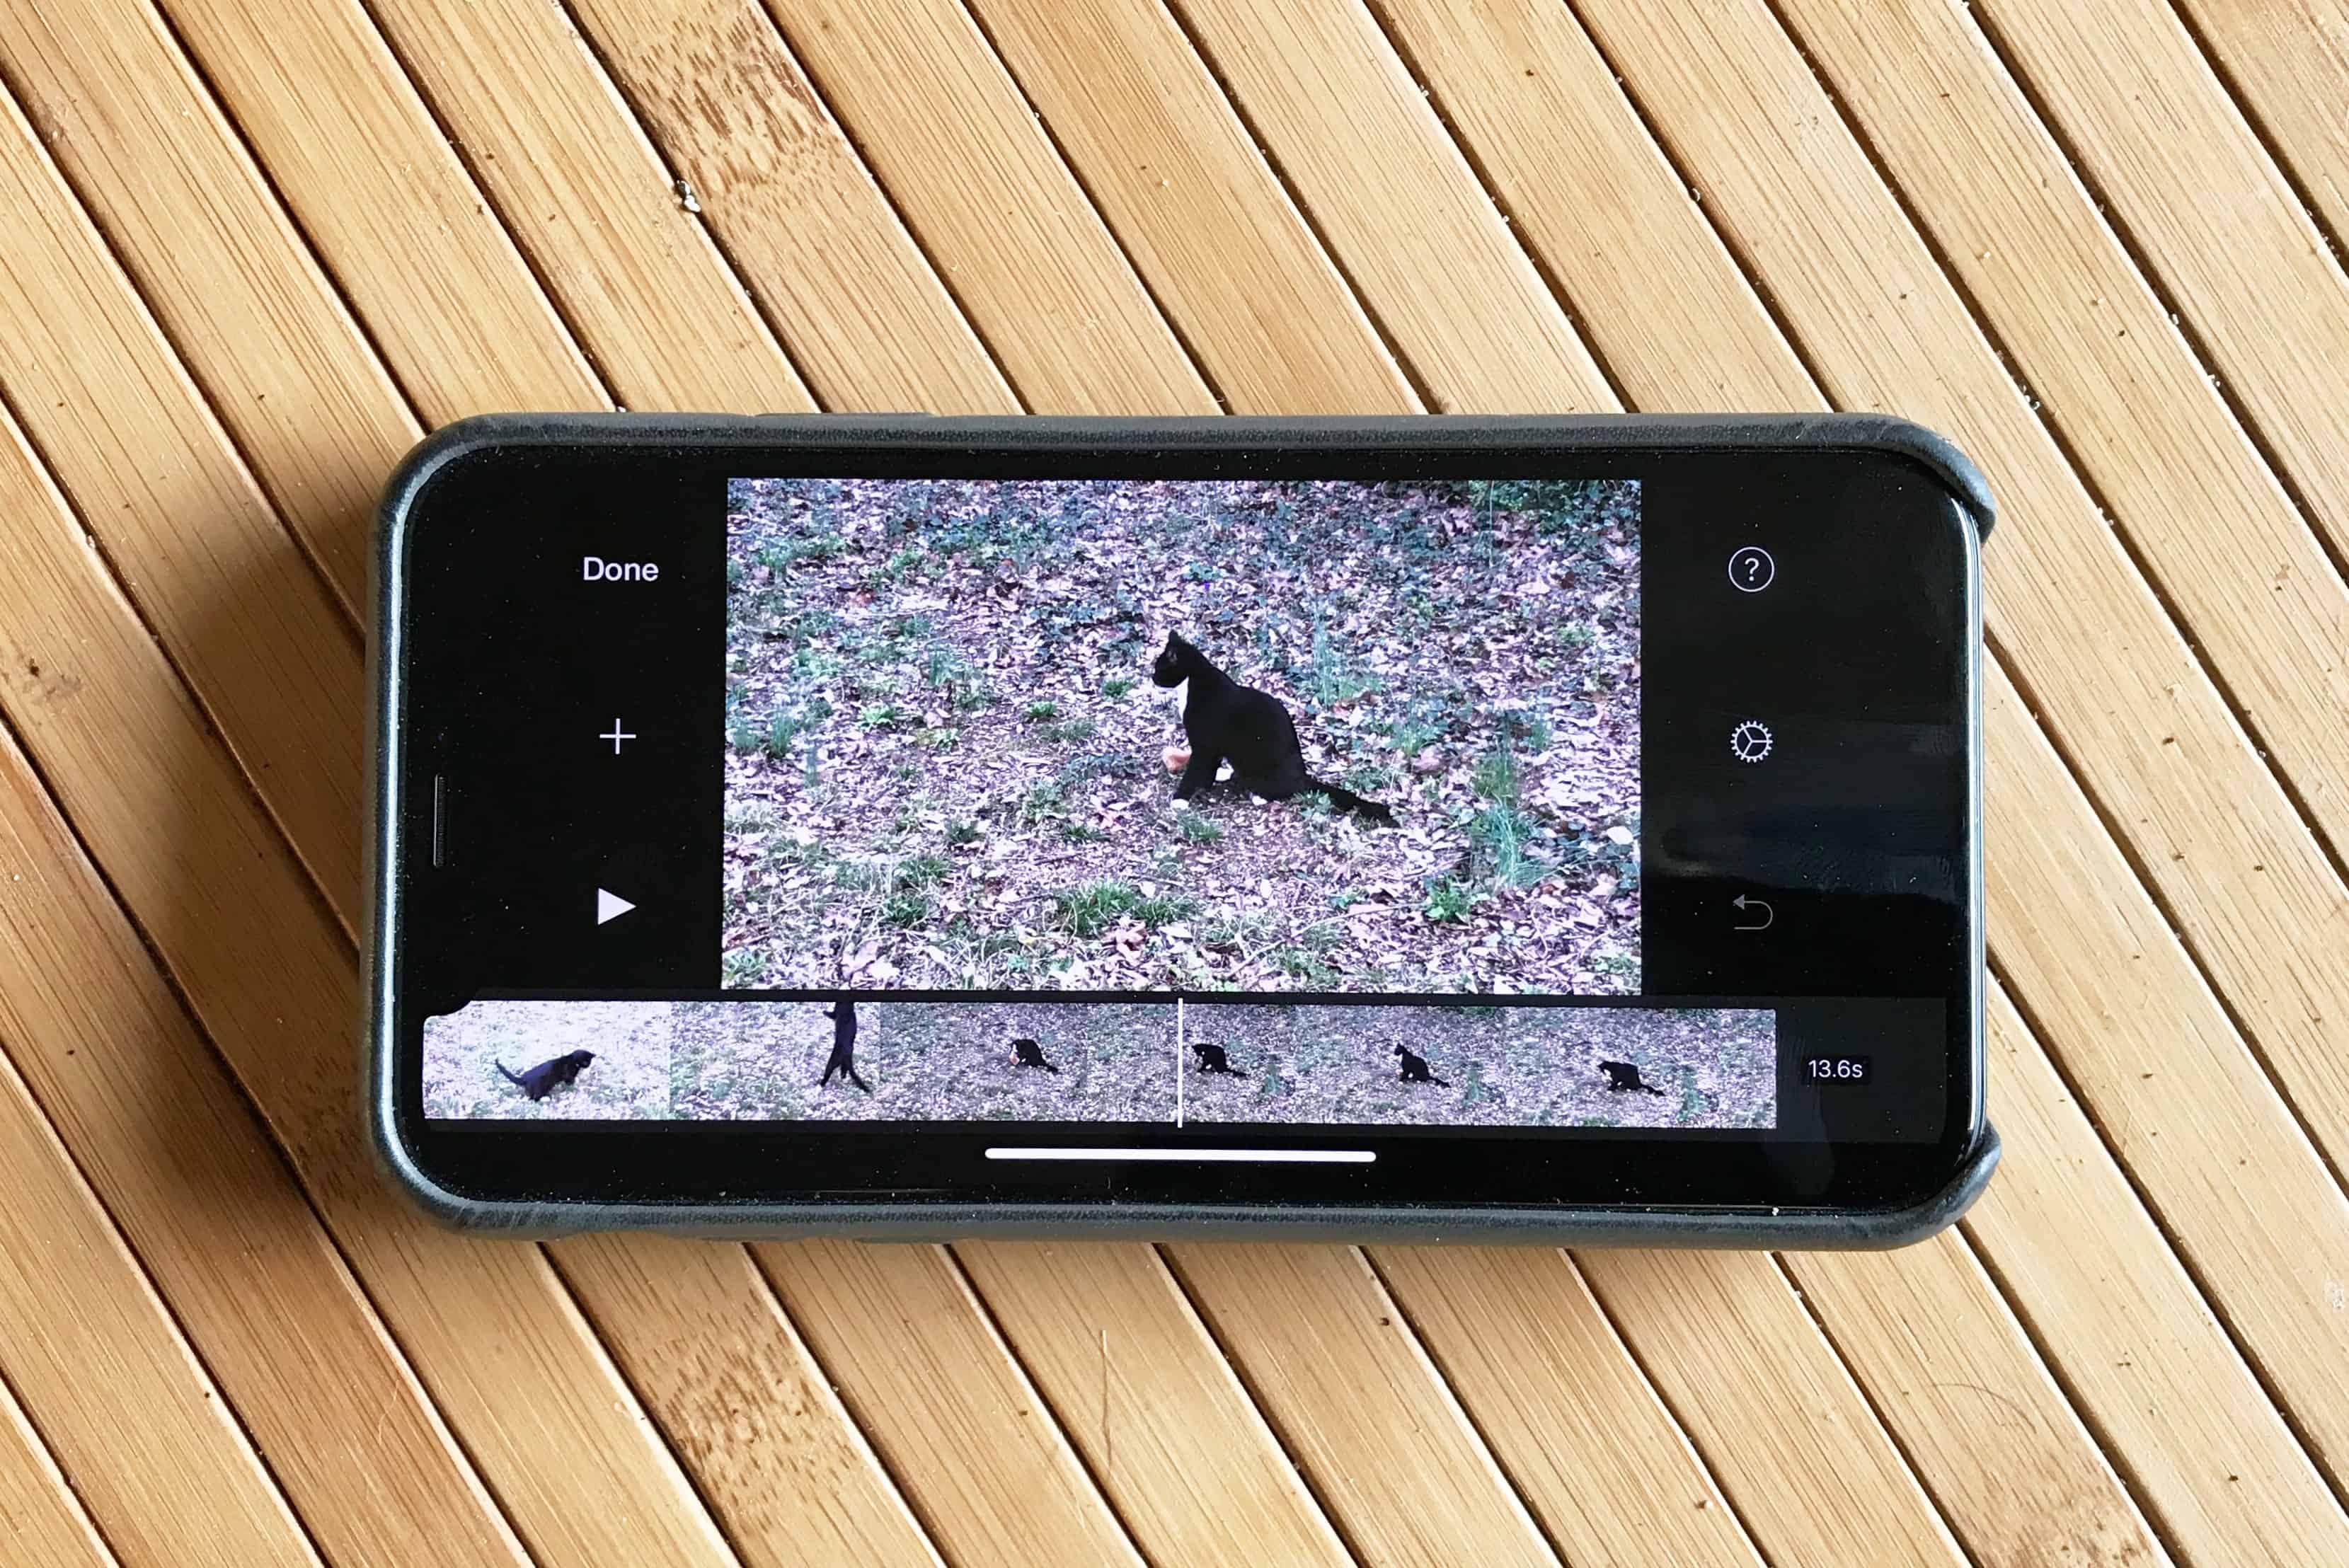 iMovie on iPhone X